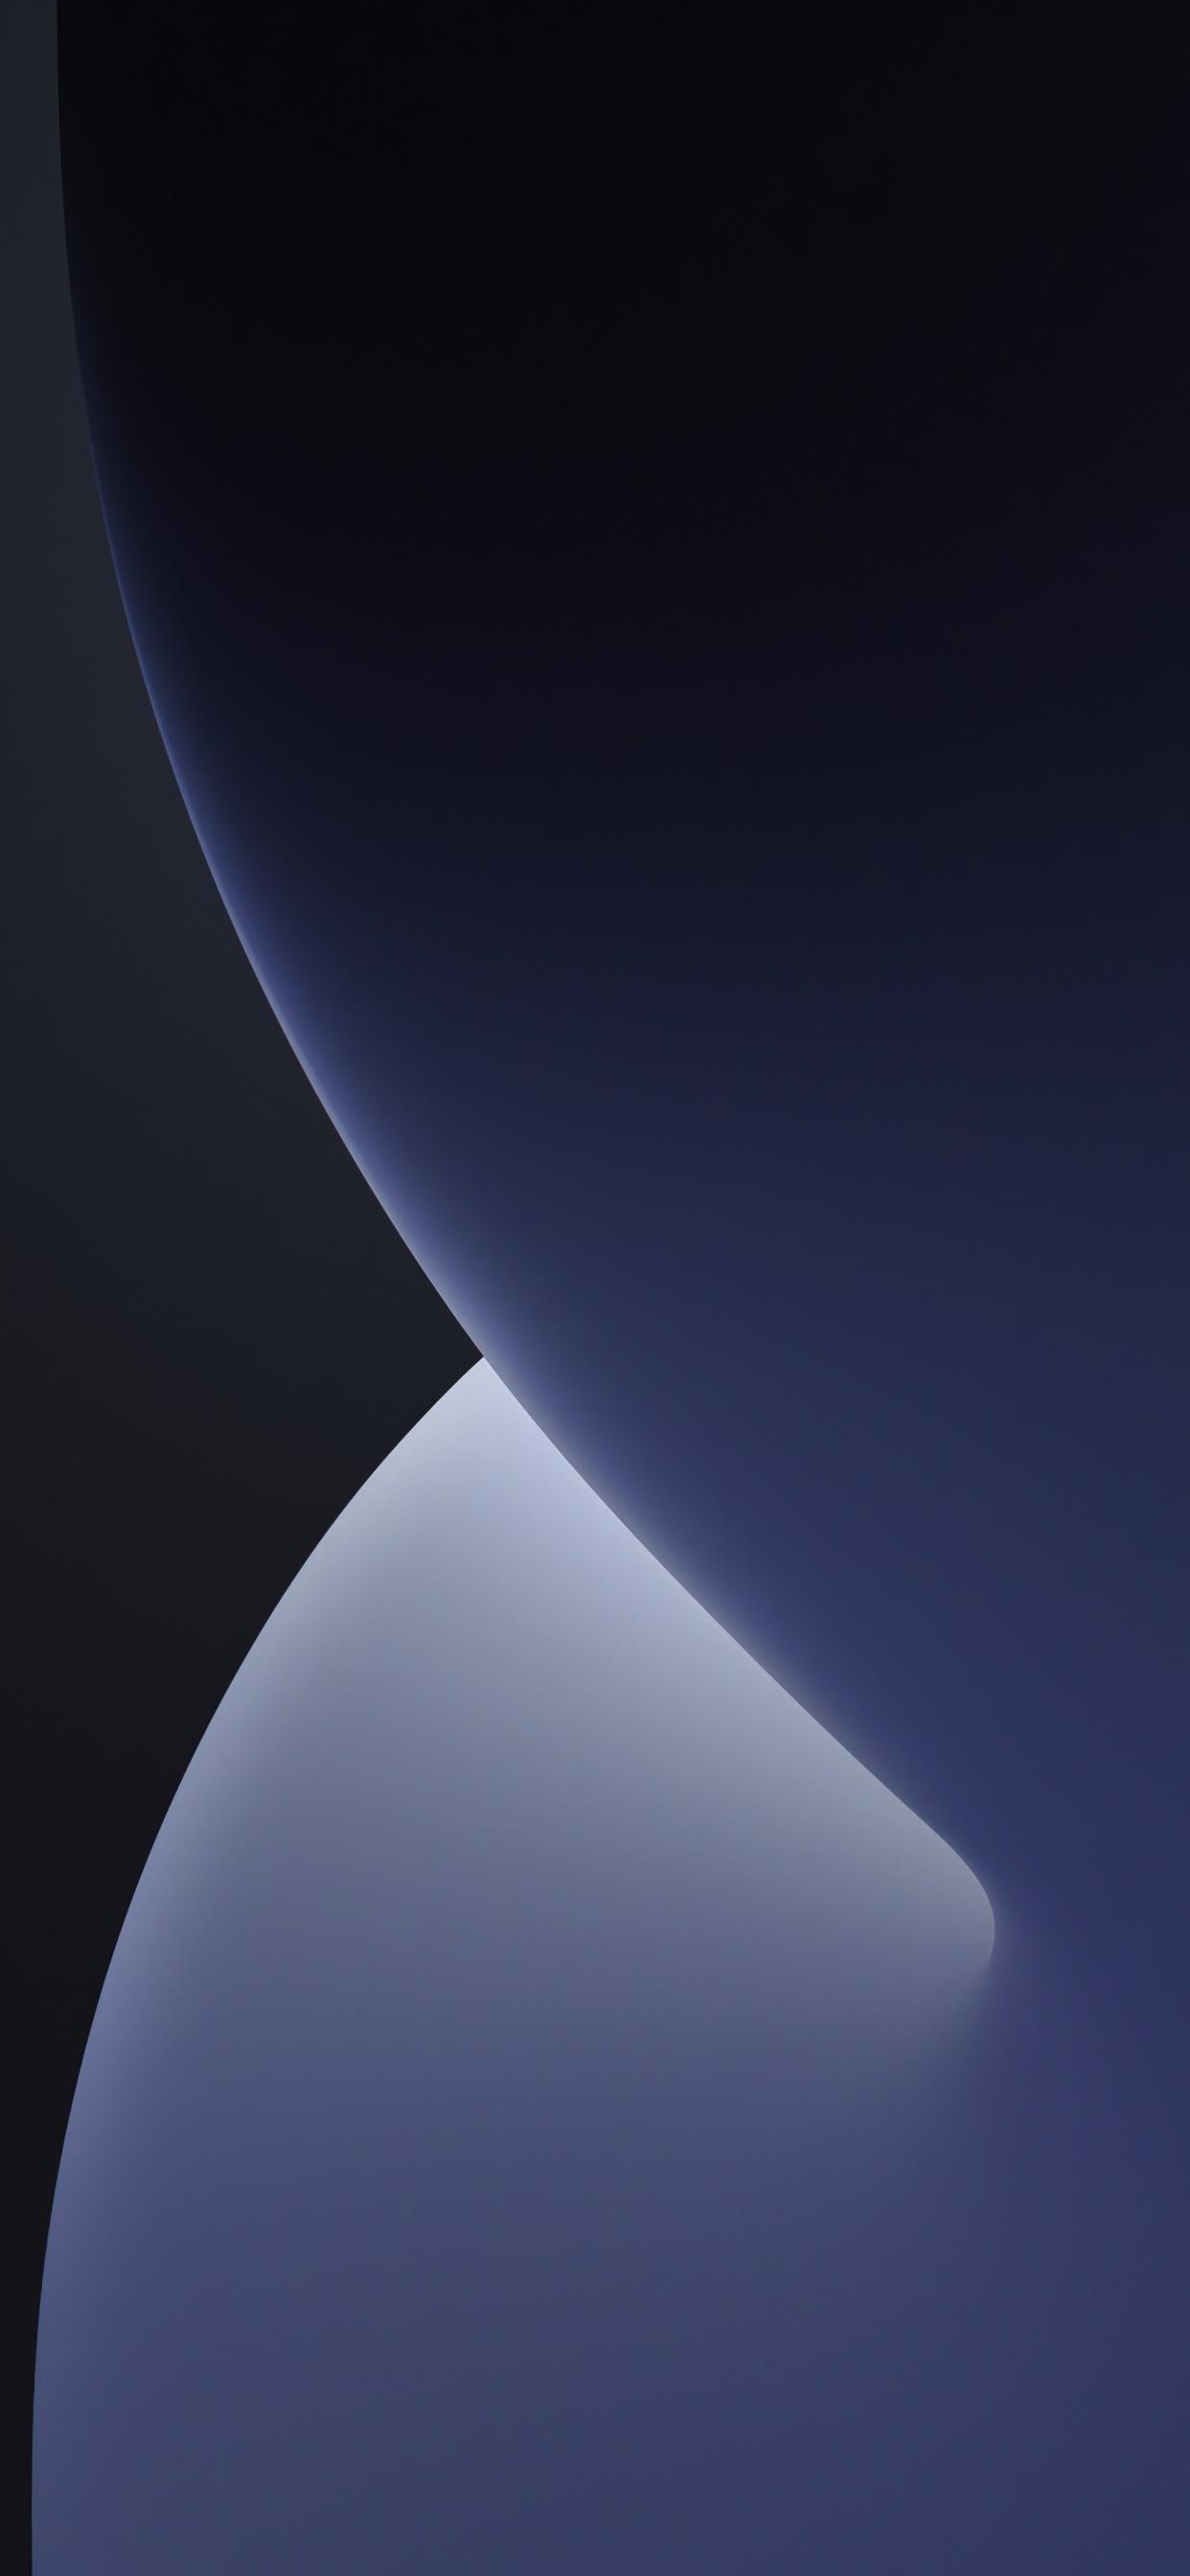 iOS 21 Wallpaper 21K, WWDC, 21, iPhone 21, iPadOS, Dark, Grey ...